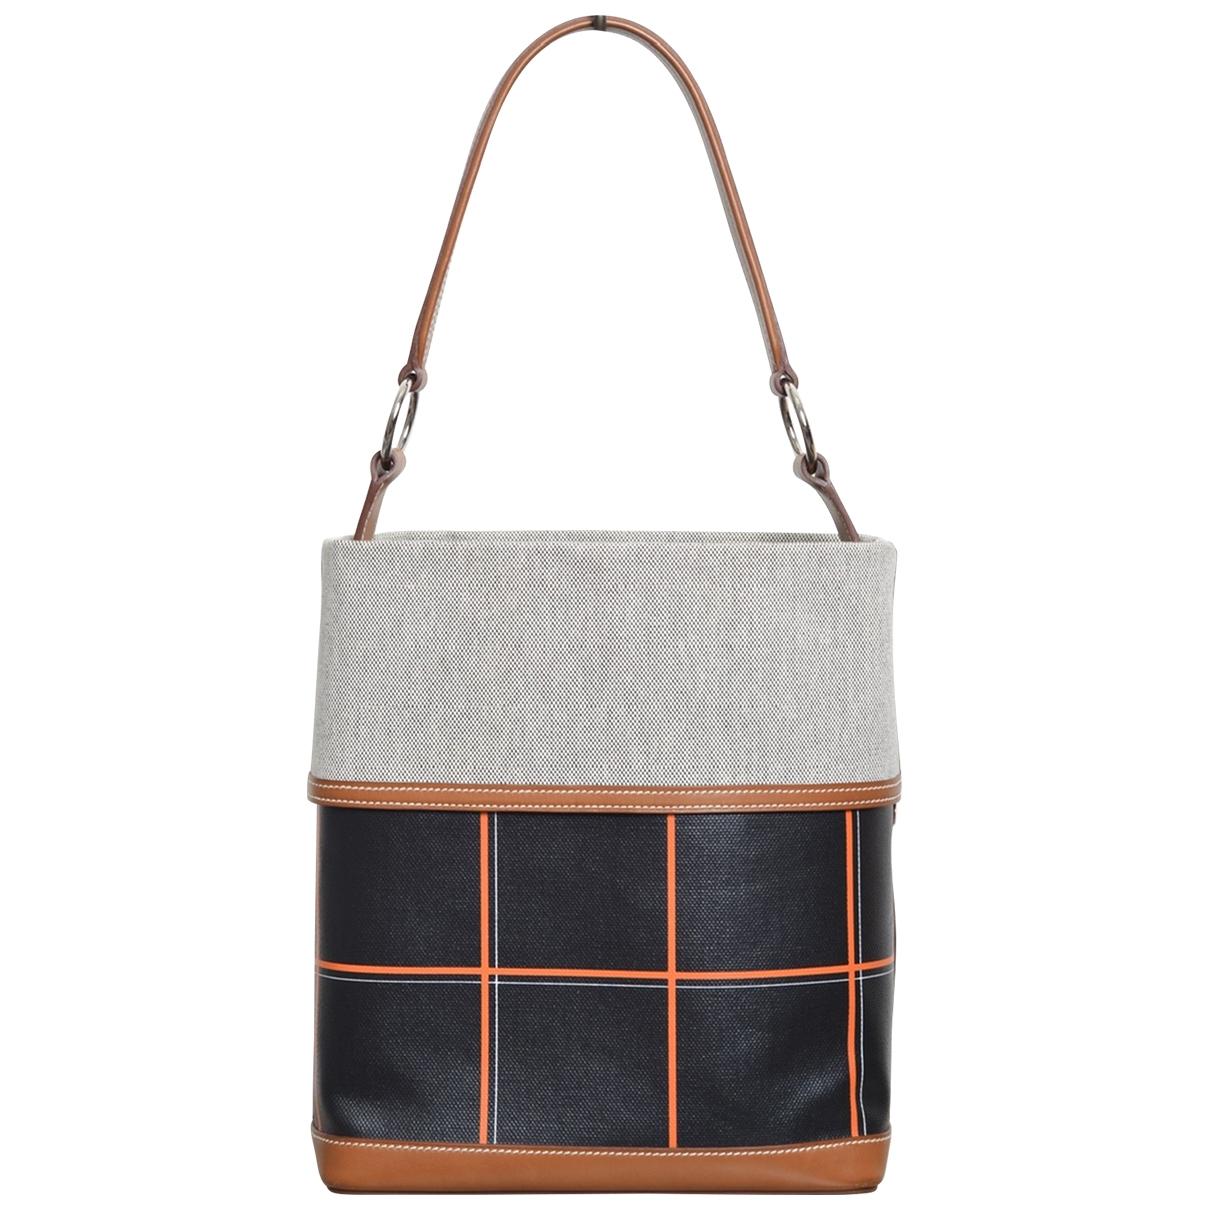 Hermès \N Black Cloth handbag for Women \N